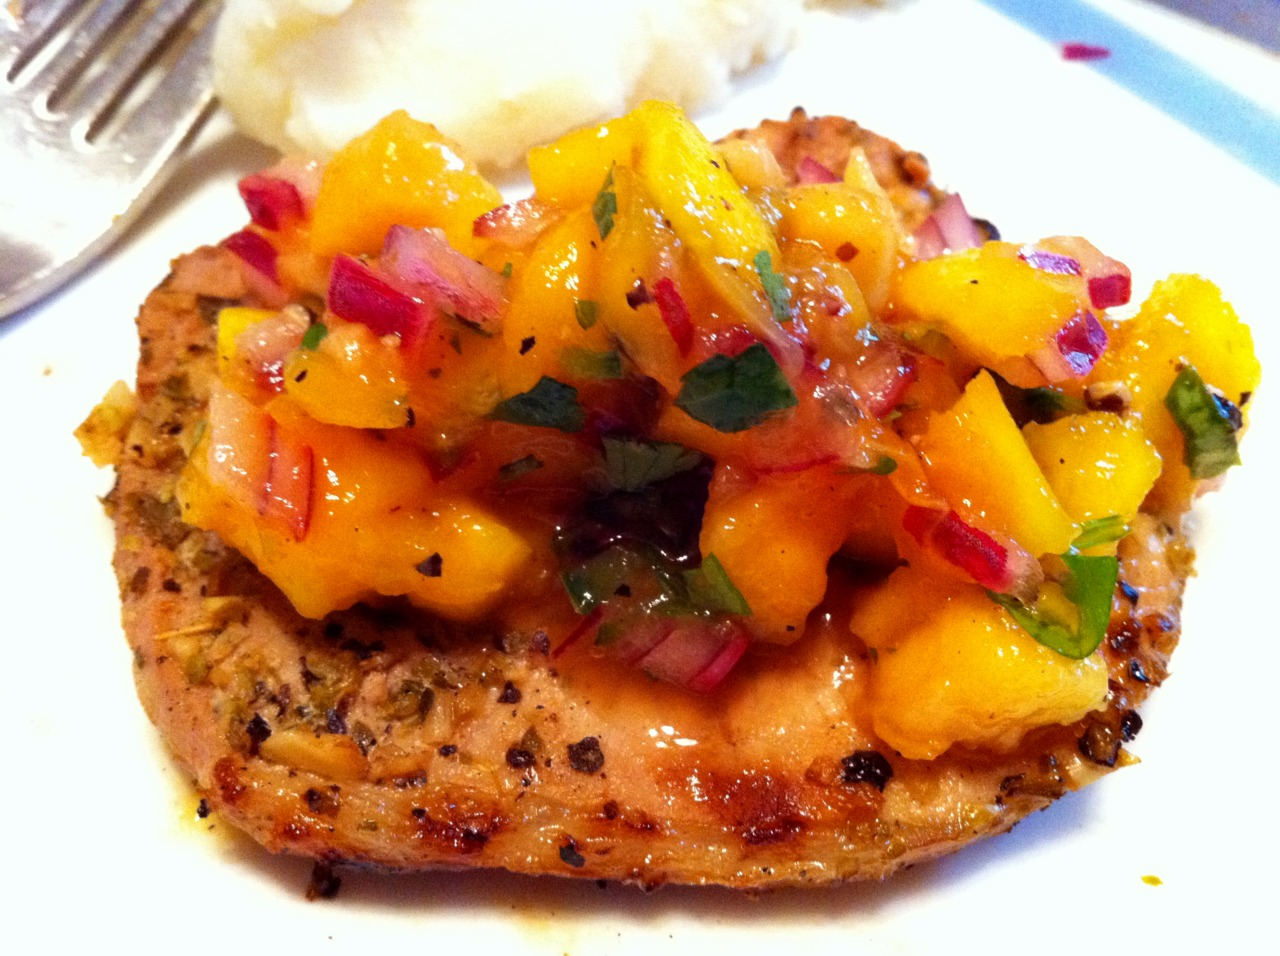 Grilled Cuban style pork with a Mango/Papaya Salsa. Recipe here: http://www.tasteofcuba.com/cubanporksalsa.html